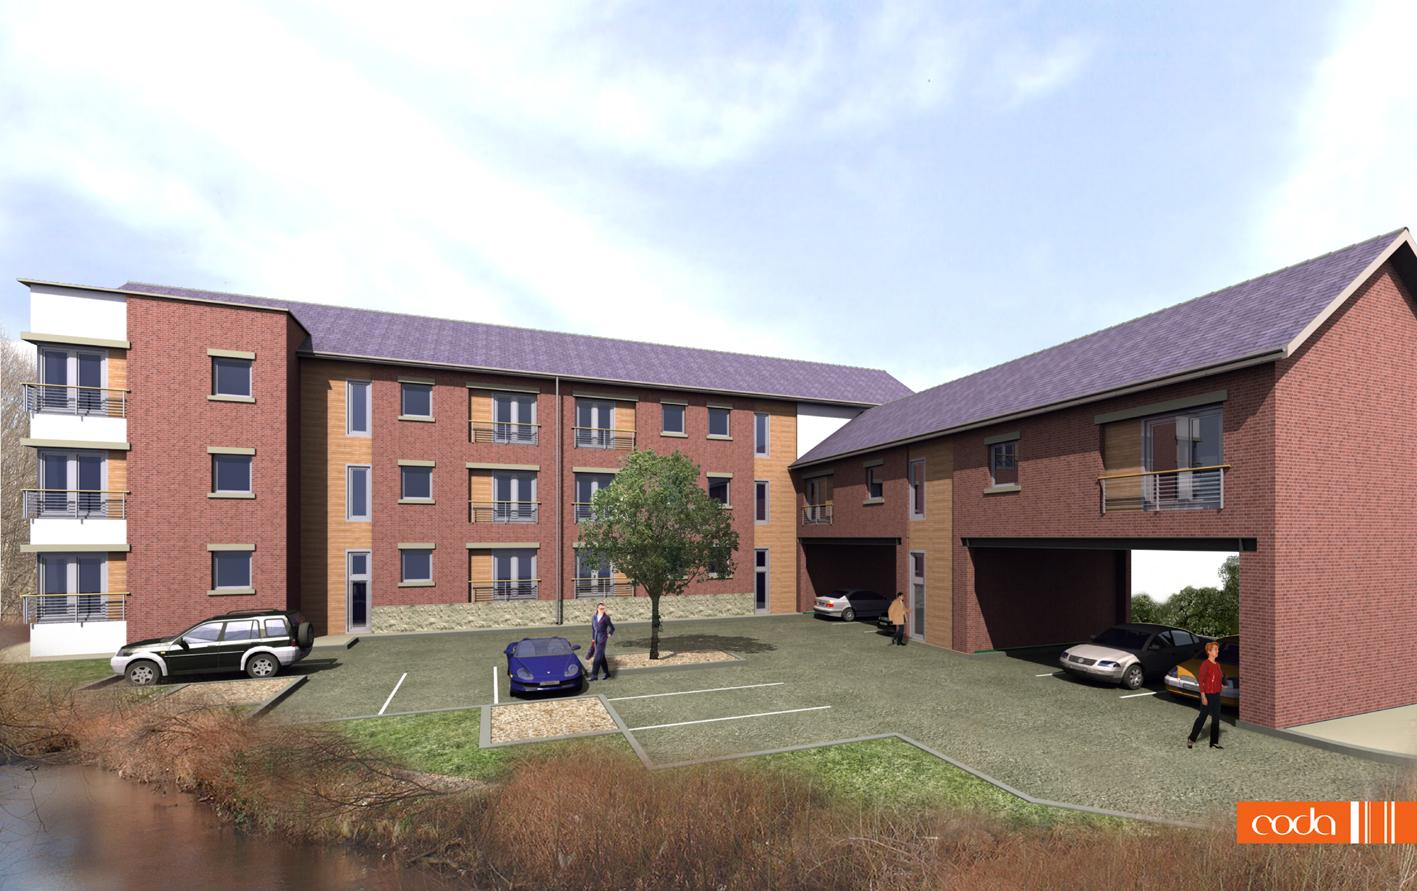 HIPPER STREET→   Residential development in the heart of Chesterfield